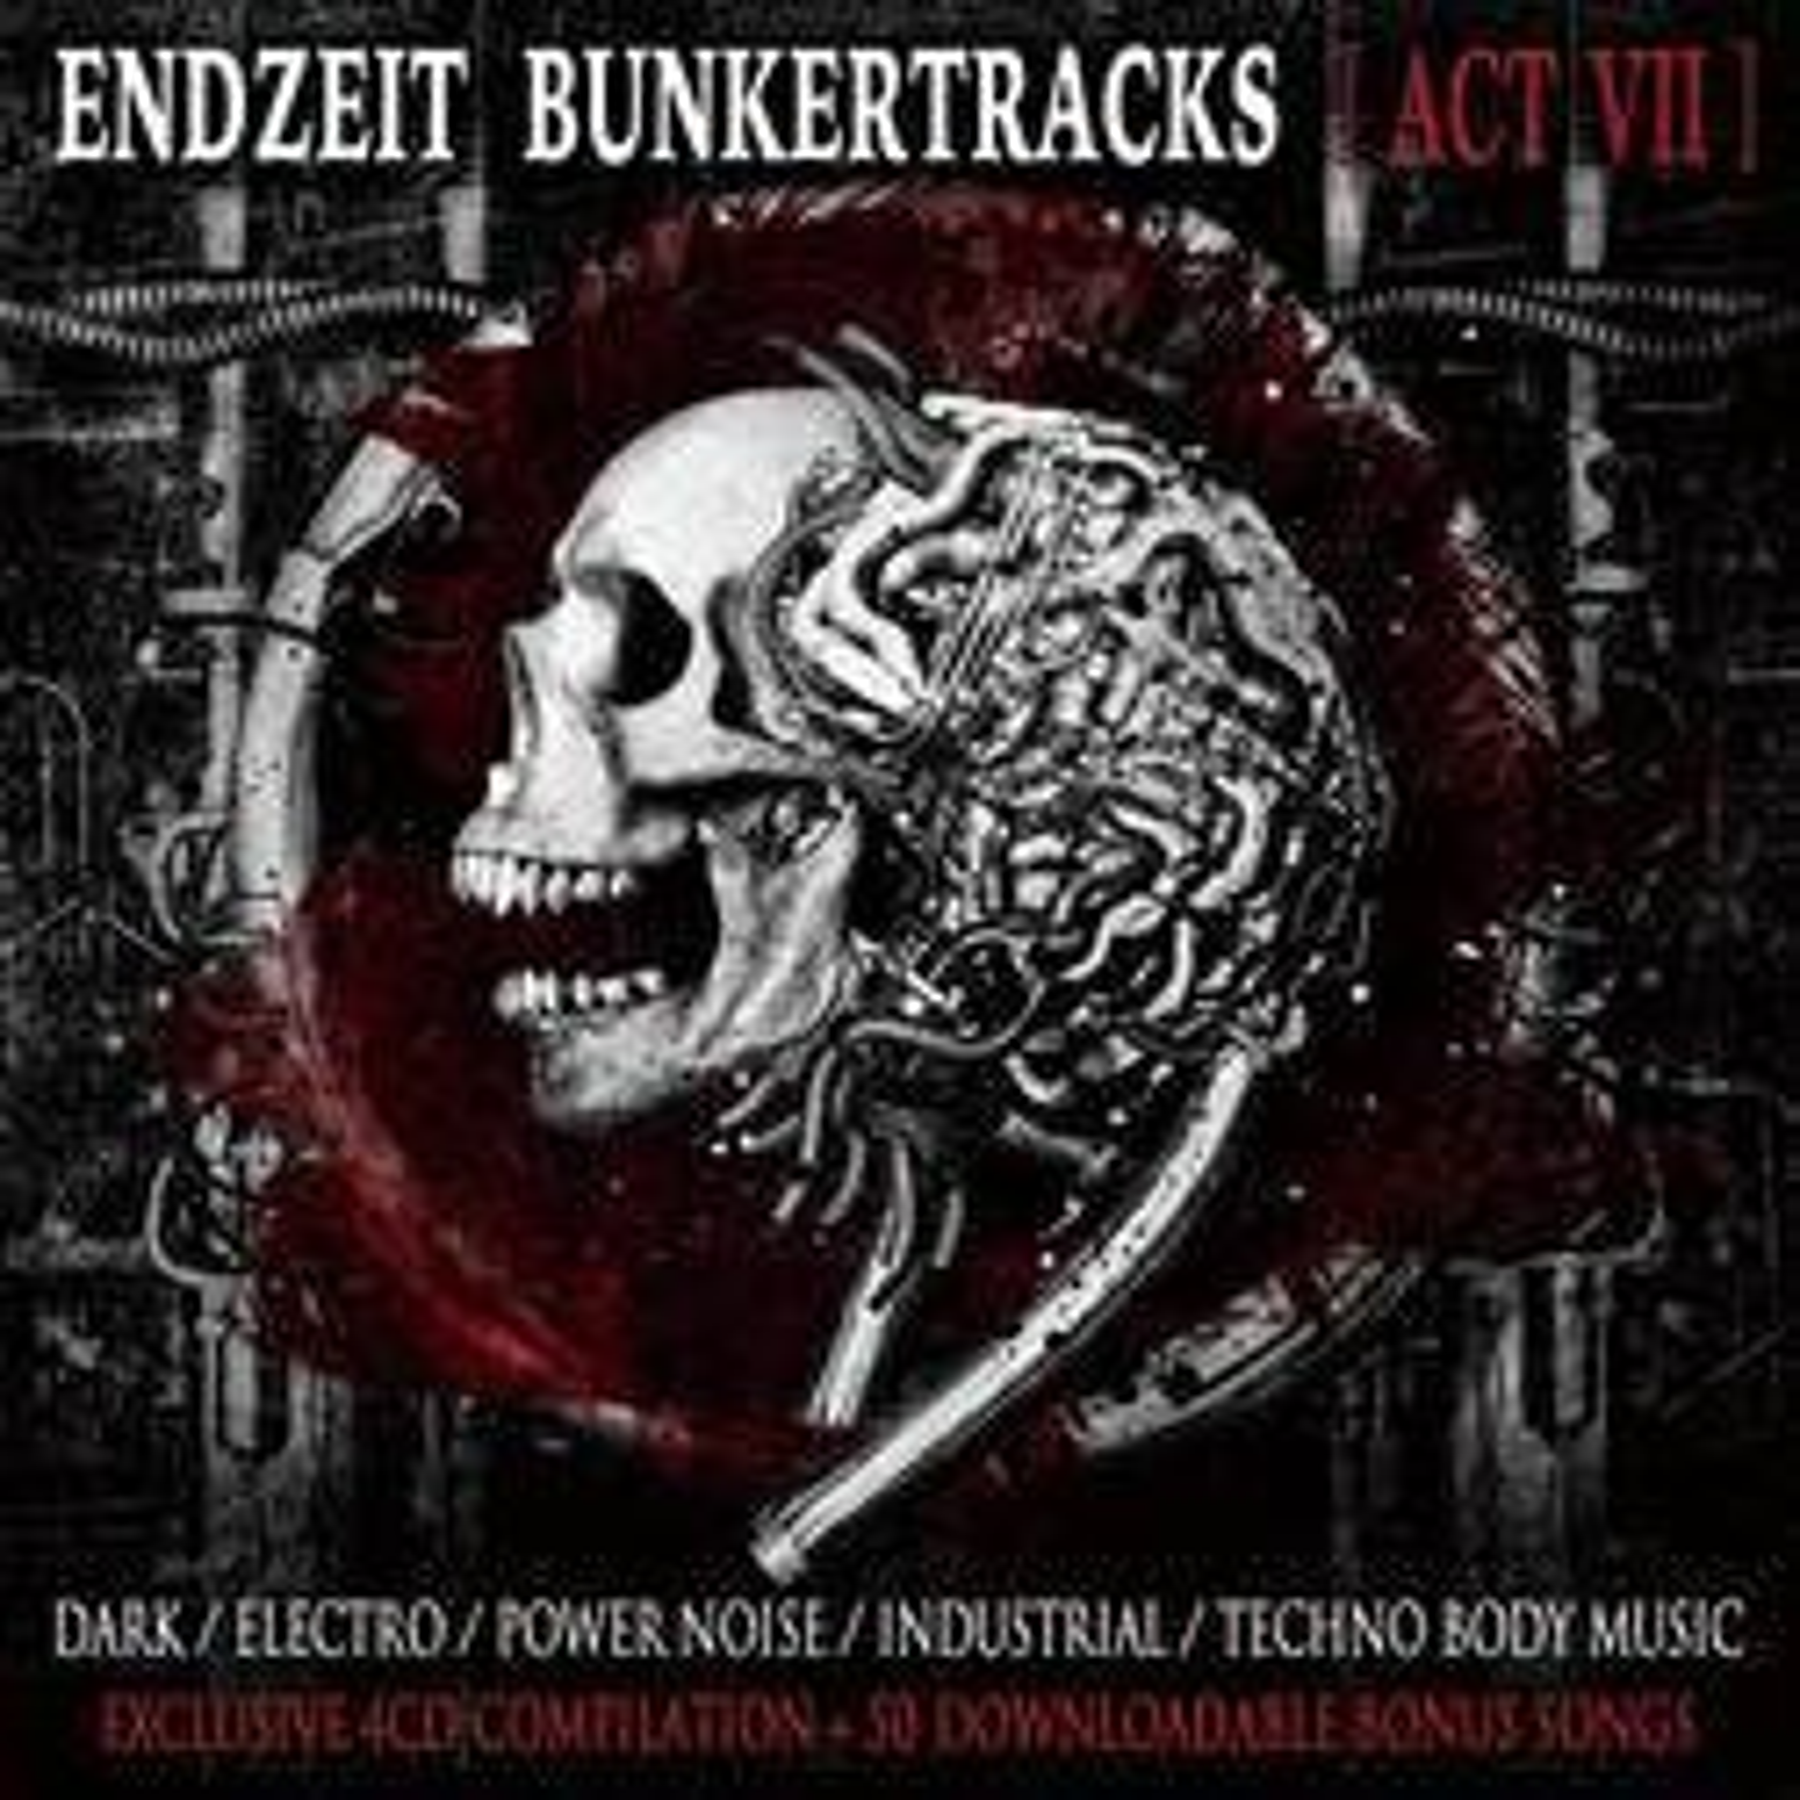 V.A. - Endzeit Bunkertracks Vol. 7 - Box Set - 4CD Box